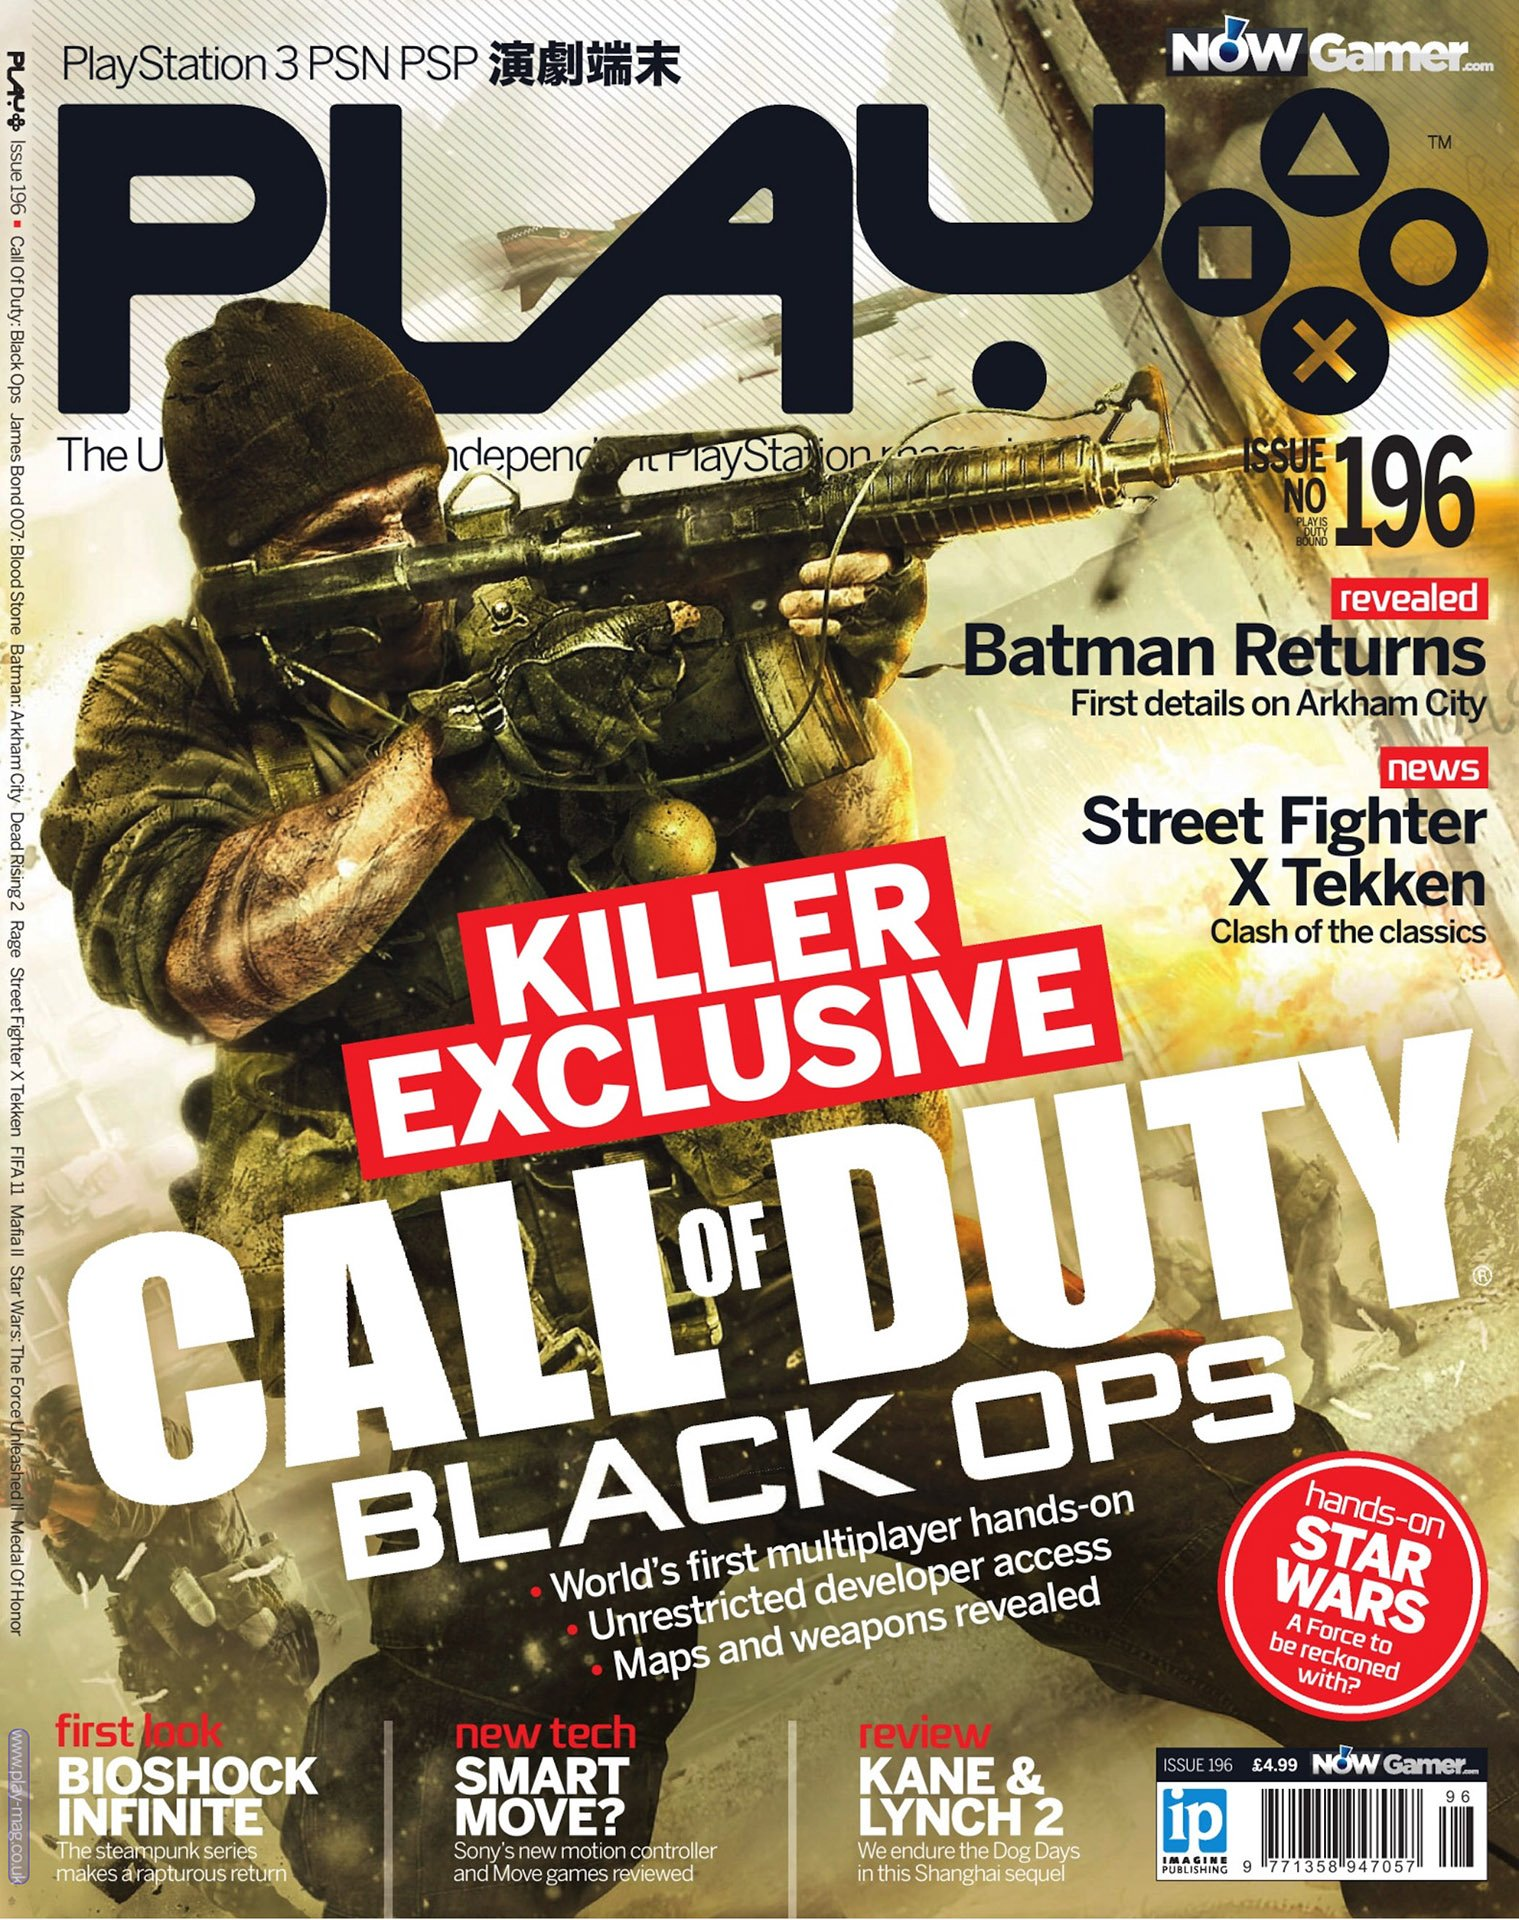 Play UK 196 (October 2010)